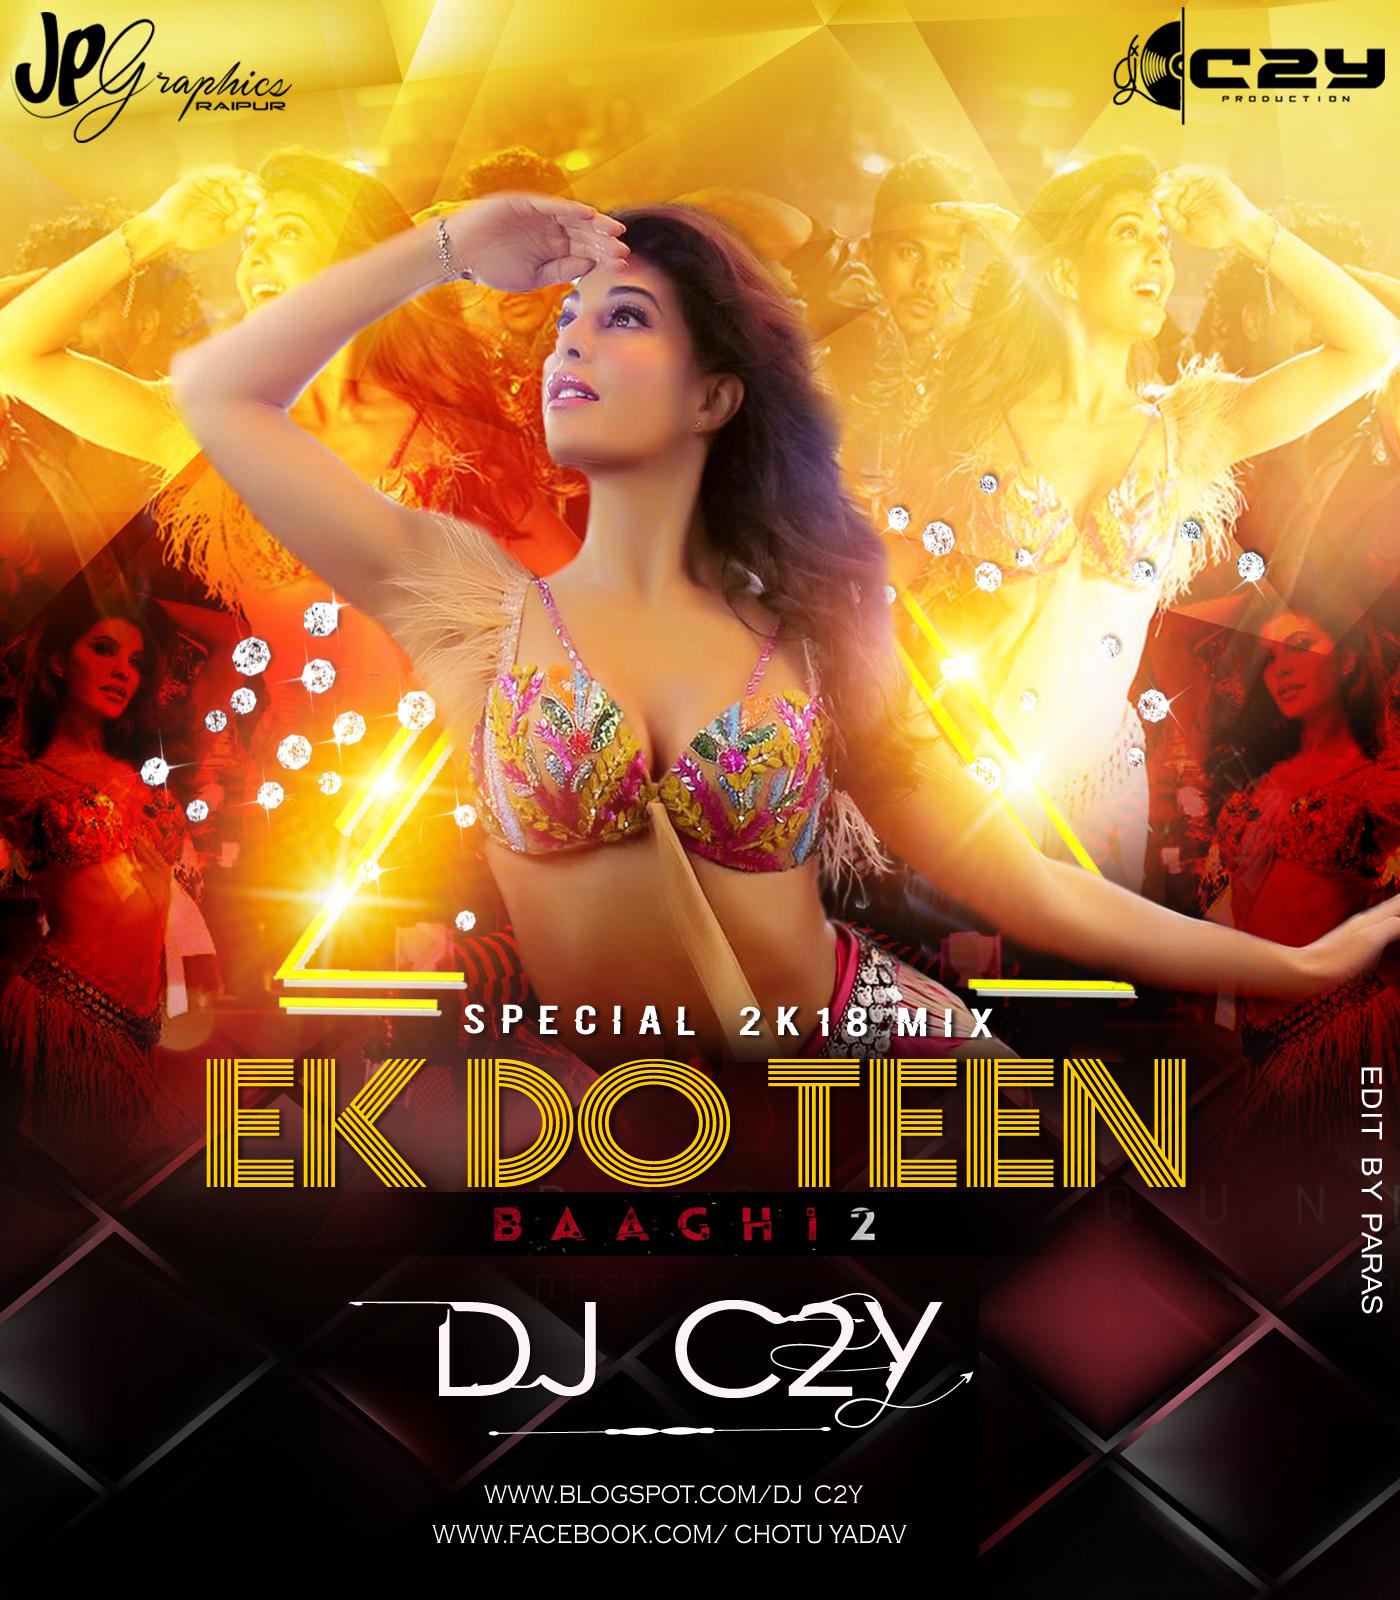 Ek Do Teen Song Baaghi 2 Download Pagalworld: Ek_Do_Teen Baaghi 2 2018 TAPORI REMIX DJ C2Y